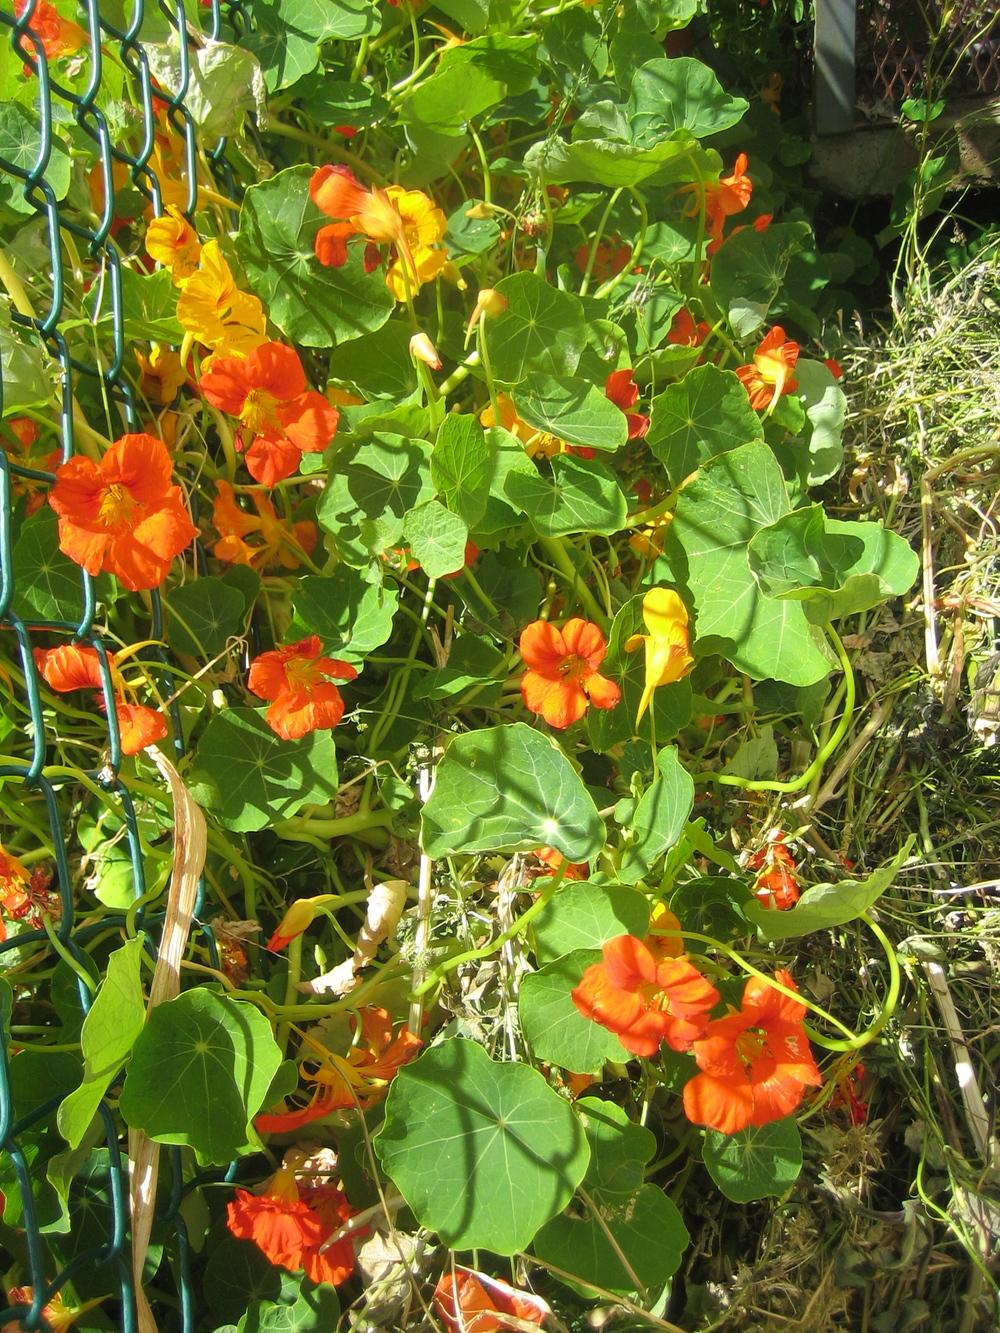 Spicy Nasturtium Flowers